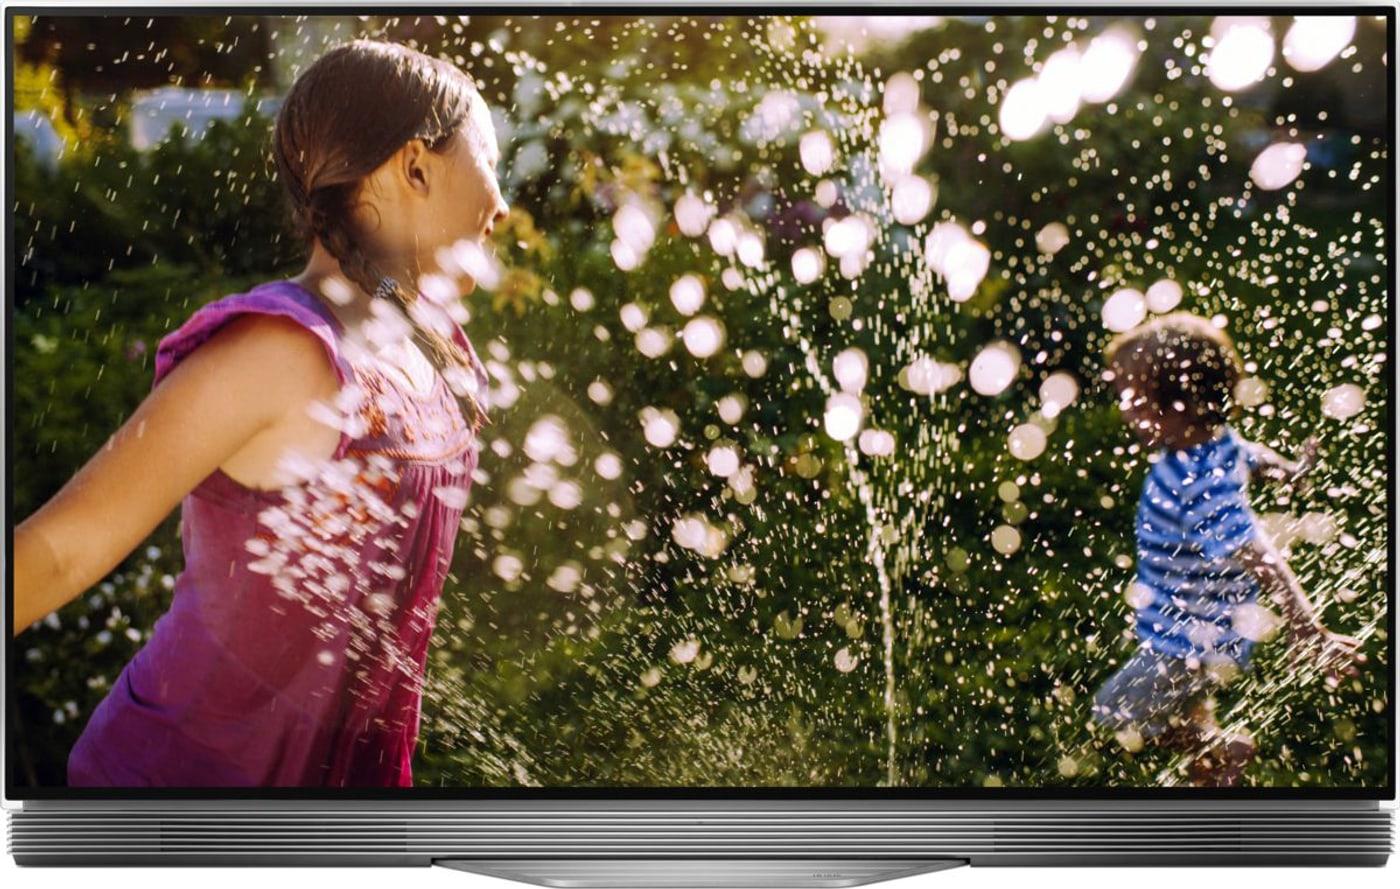 LG OLED55E7N 139 cm 4K OLED TV Fernseher | Migros